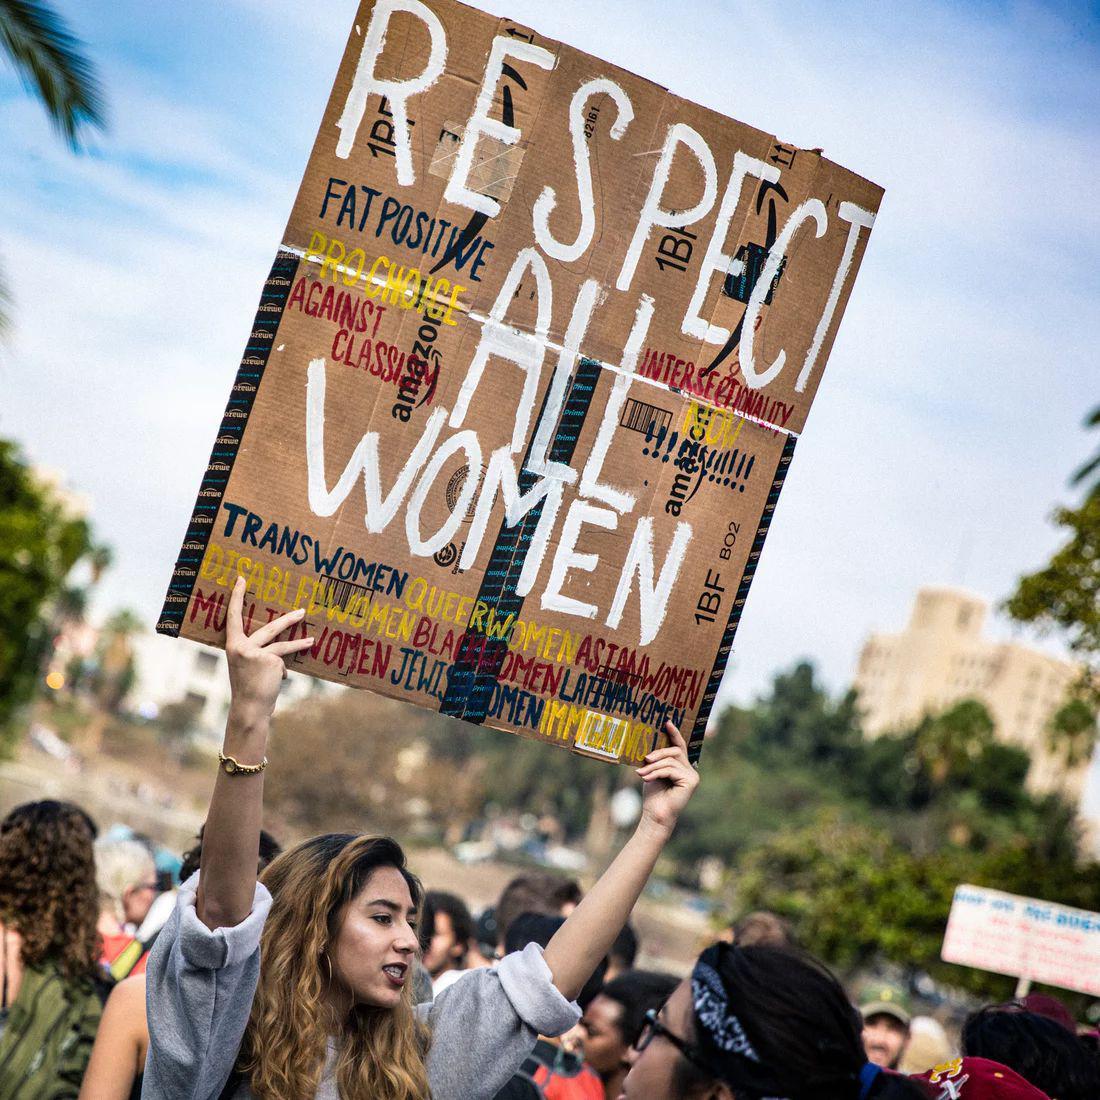 Comunicación social y feminismo